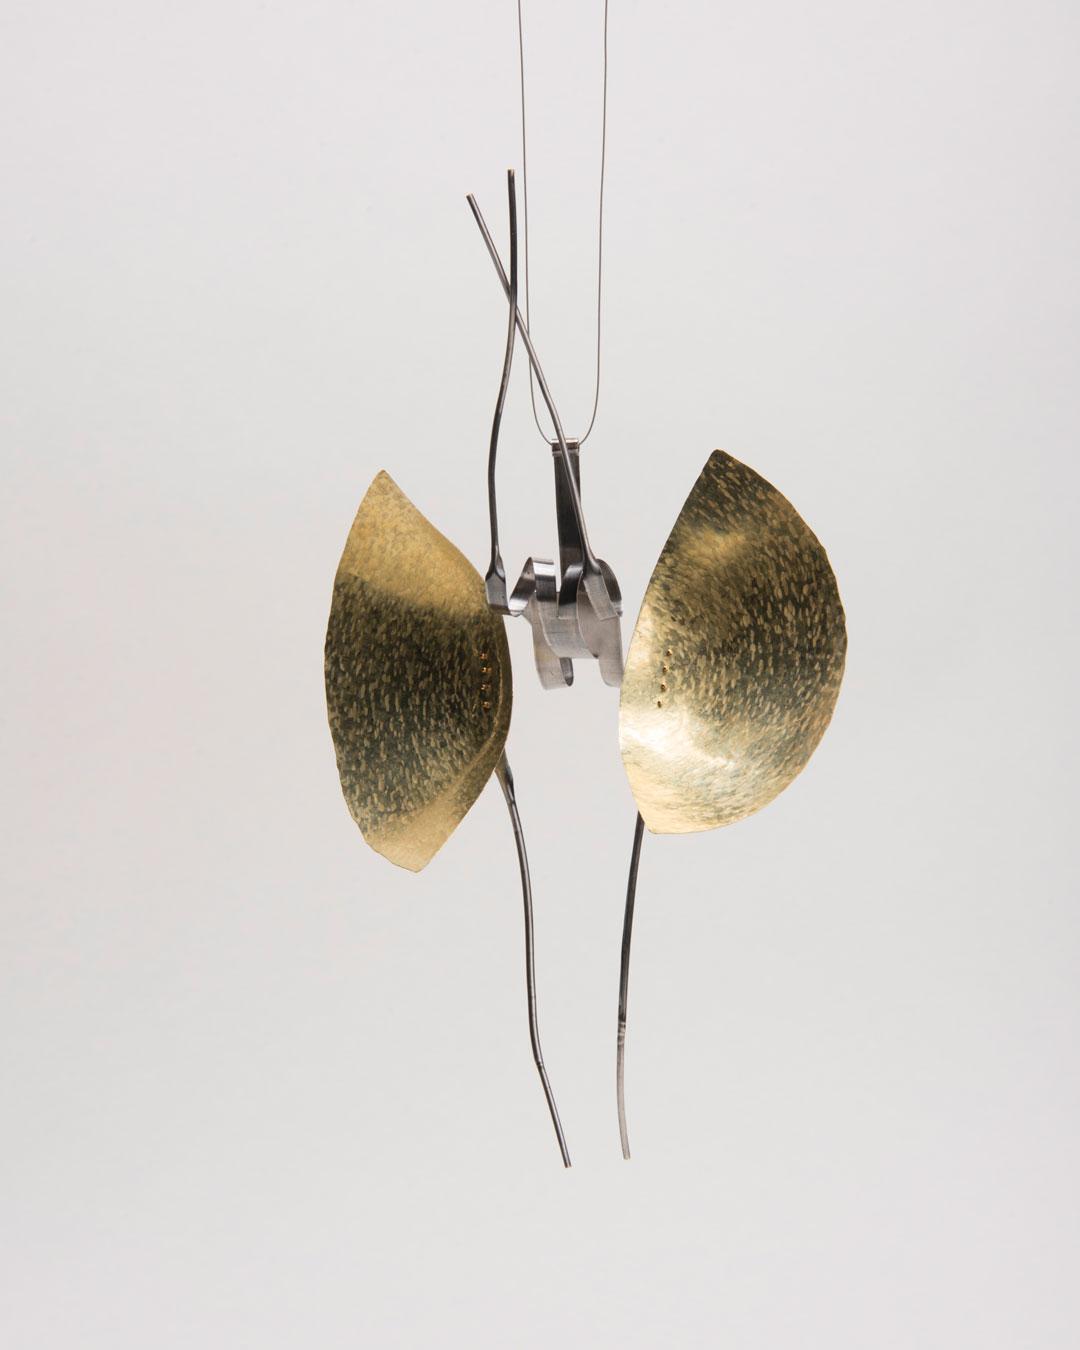 Andrea Wippermann, Mantis Religiosa, 2018, pendant; gold, stainless steel, blackened silver, nylon, 220 x 140 x 80 mm, €4600